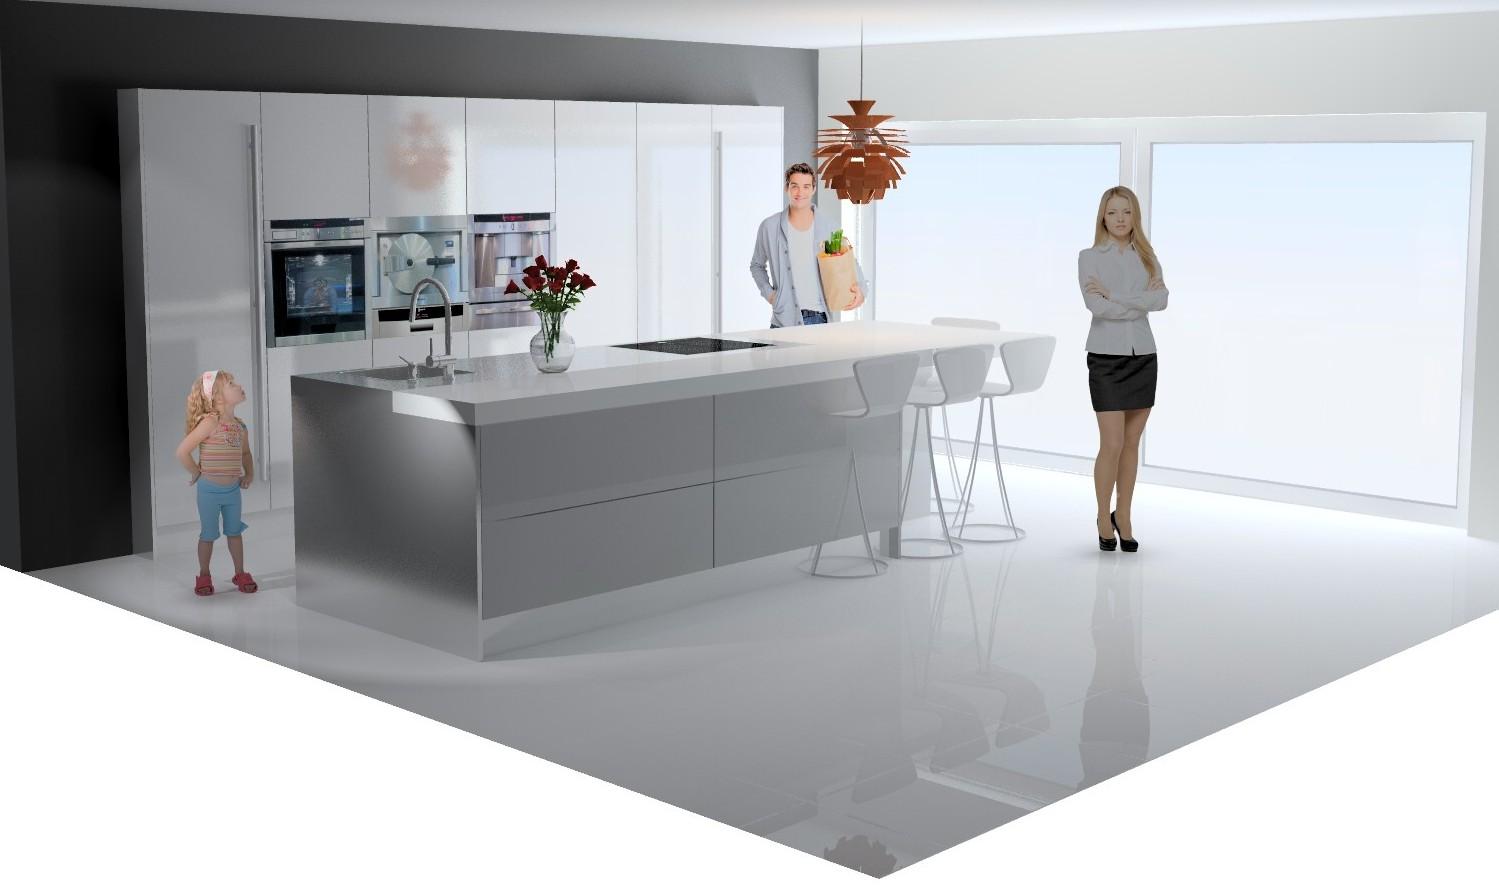 Design Keuken Duitsland : Italiaanse design keuken in Duitsland ...